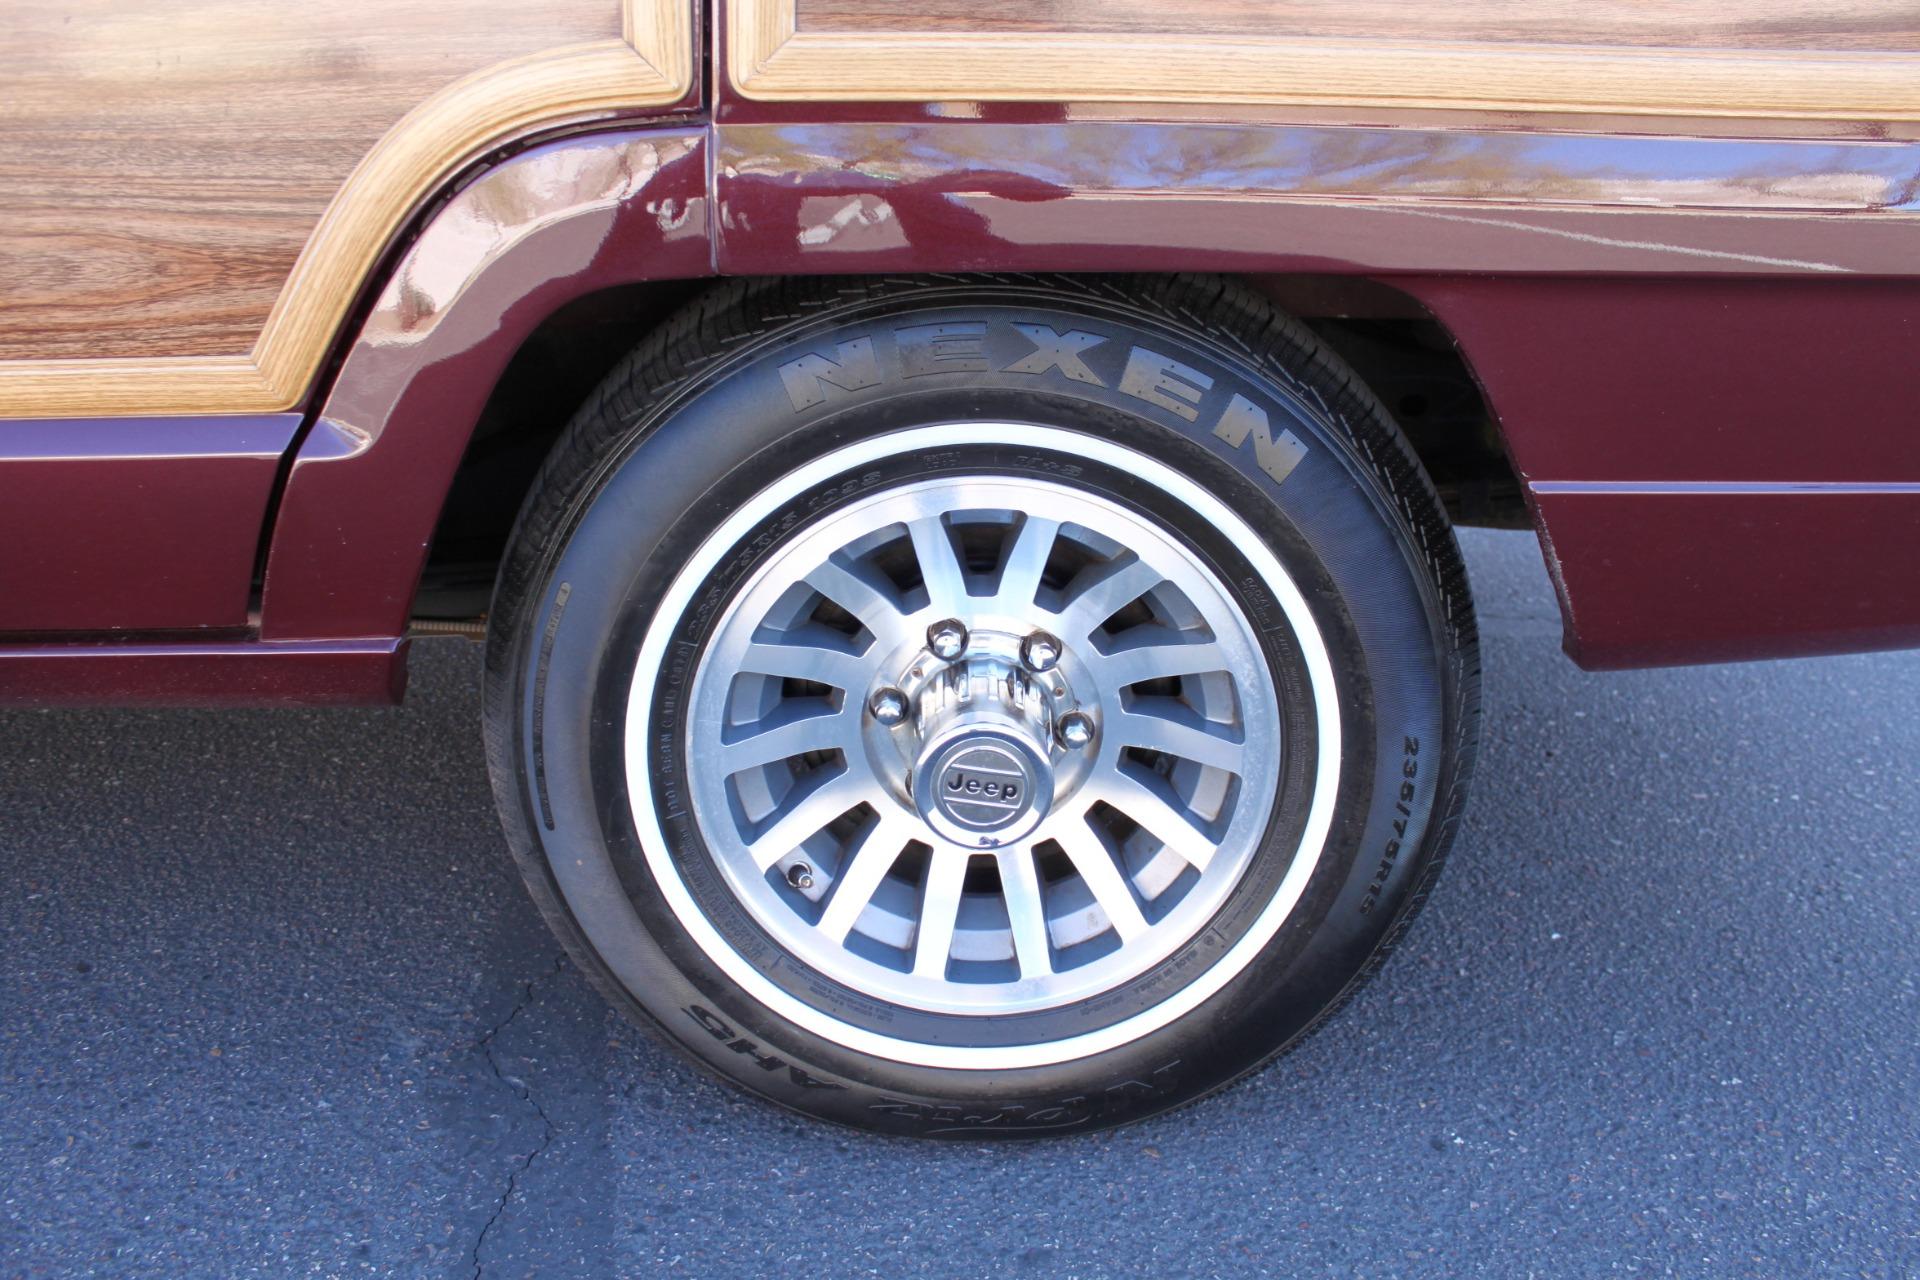 Used-1988-Jeep-Grand-Wagoneer-Audi